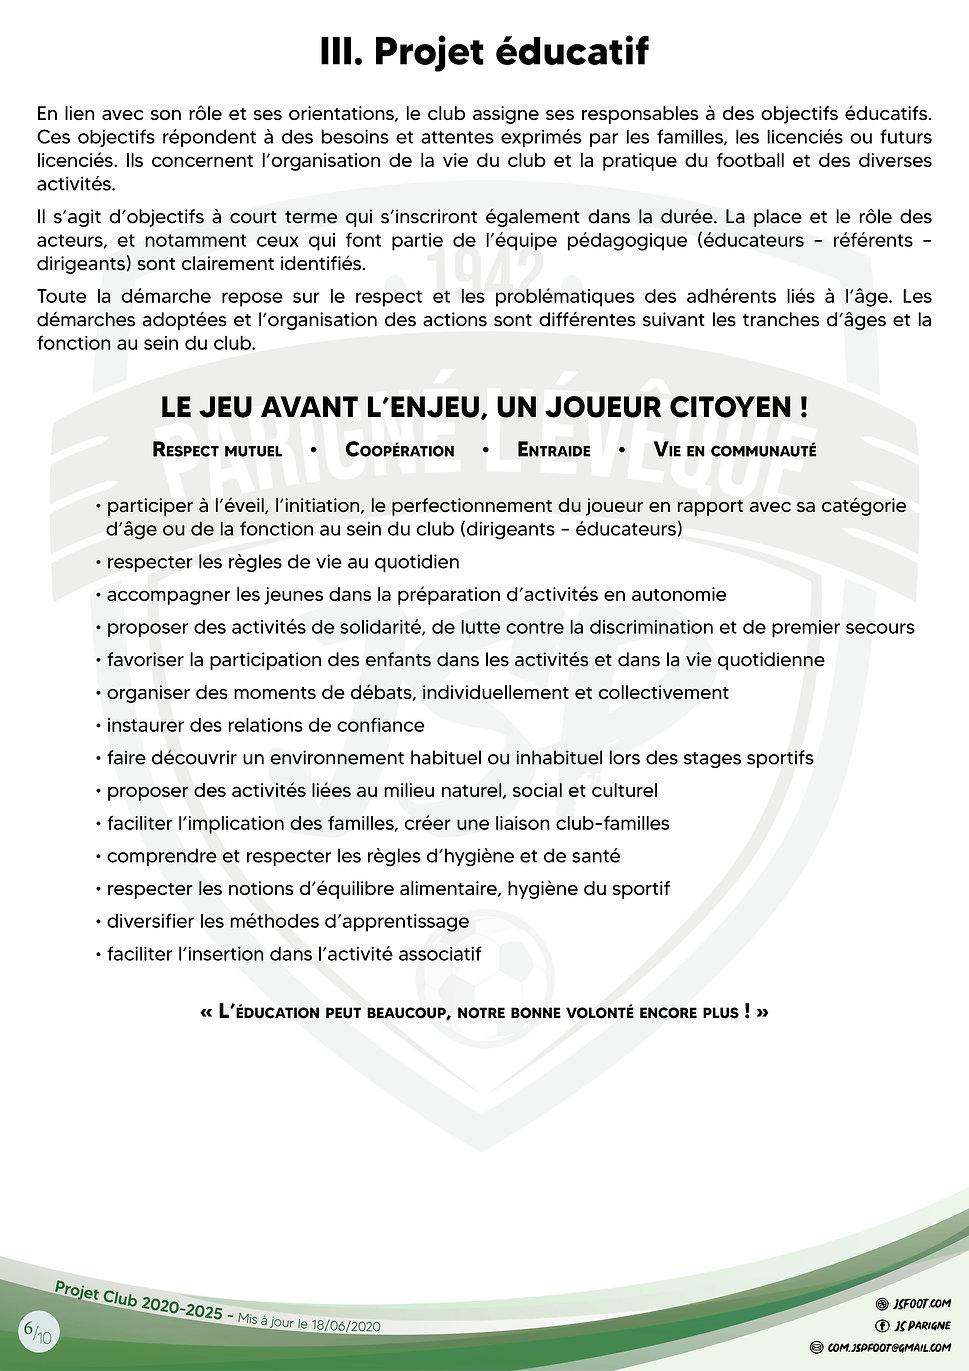 Projet Club 2020-20256.jpg